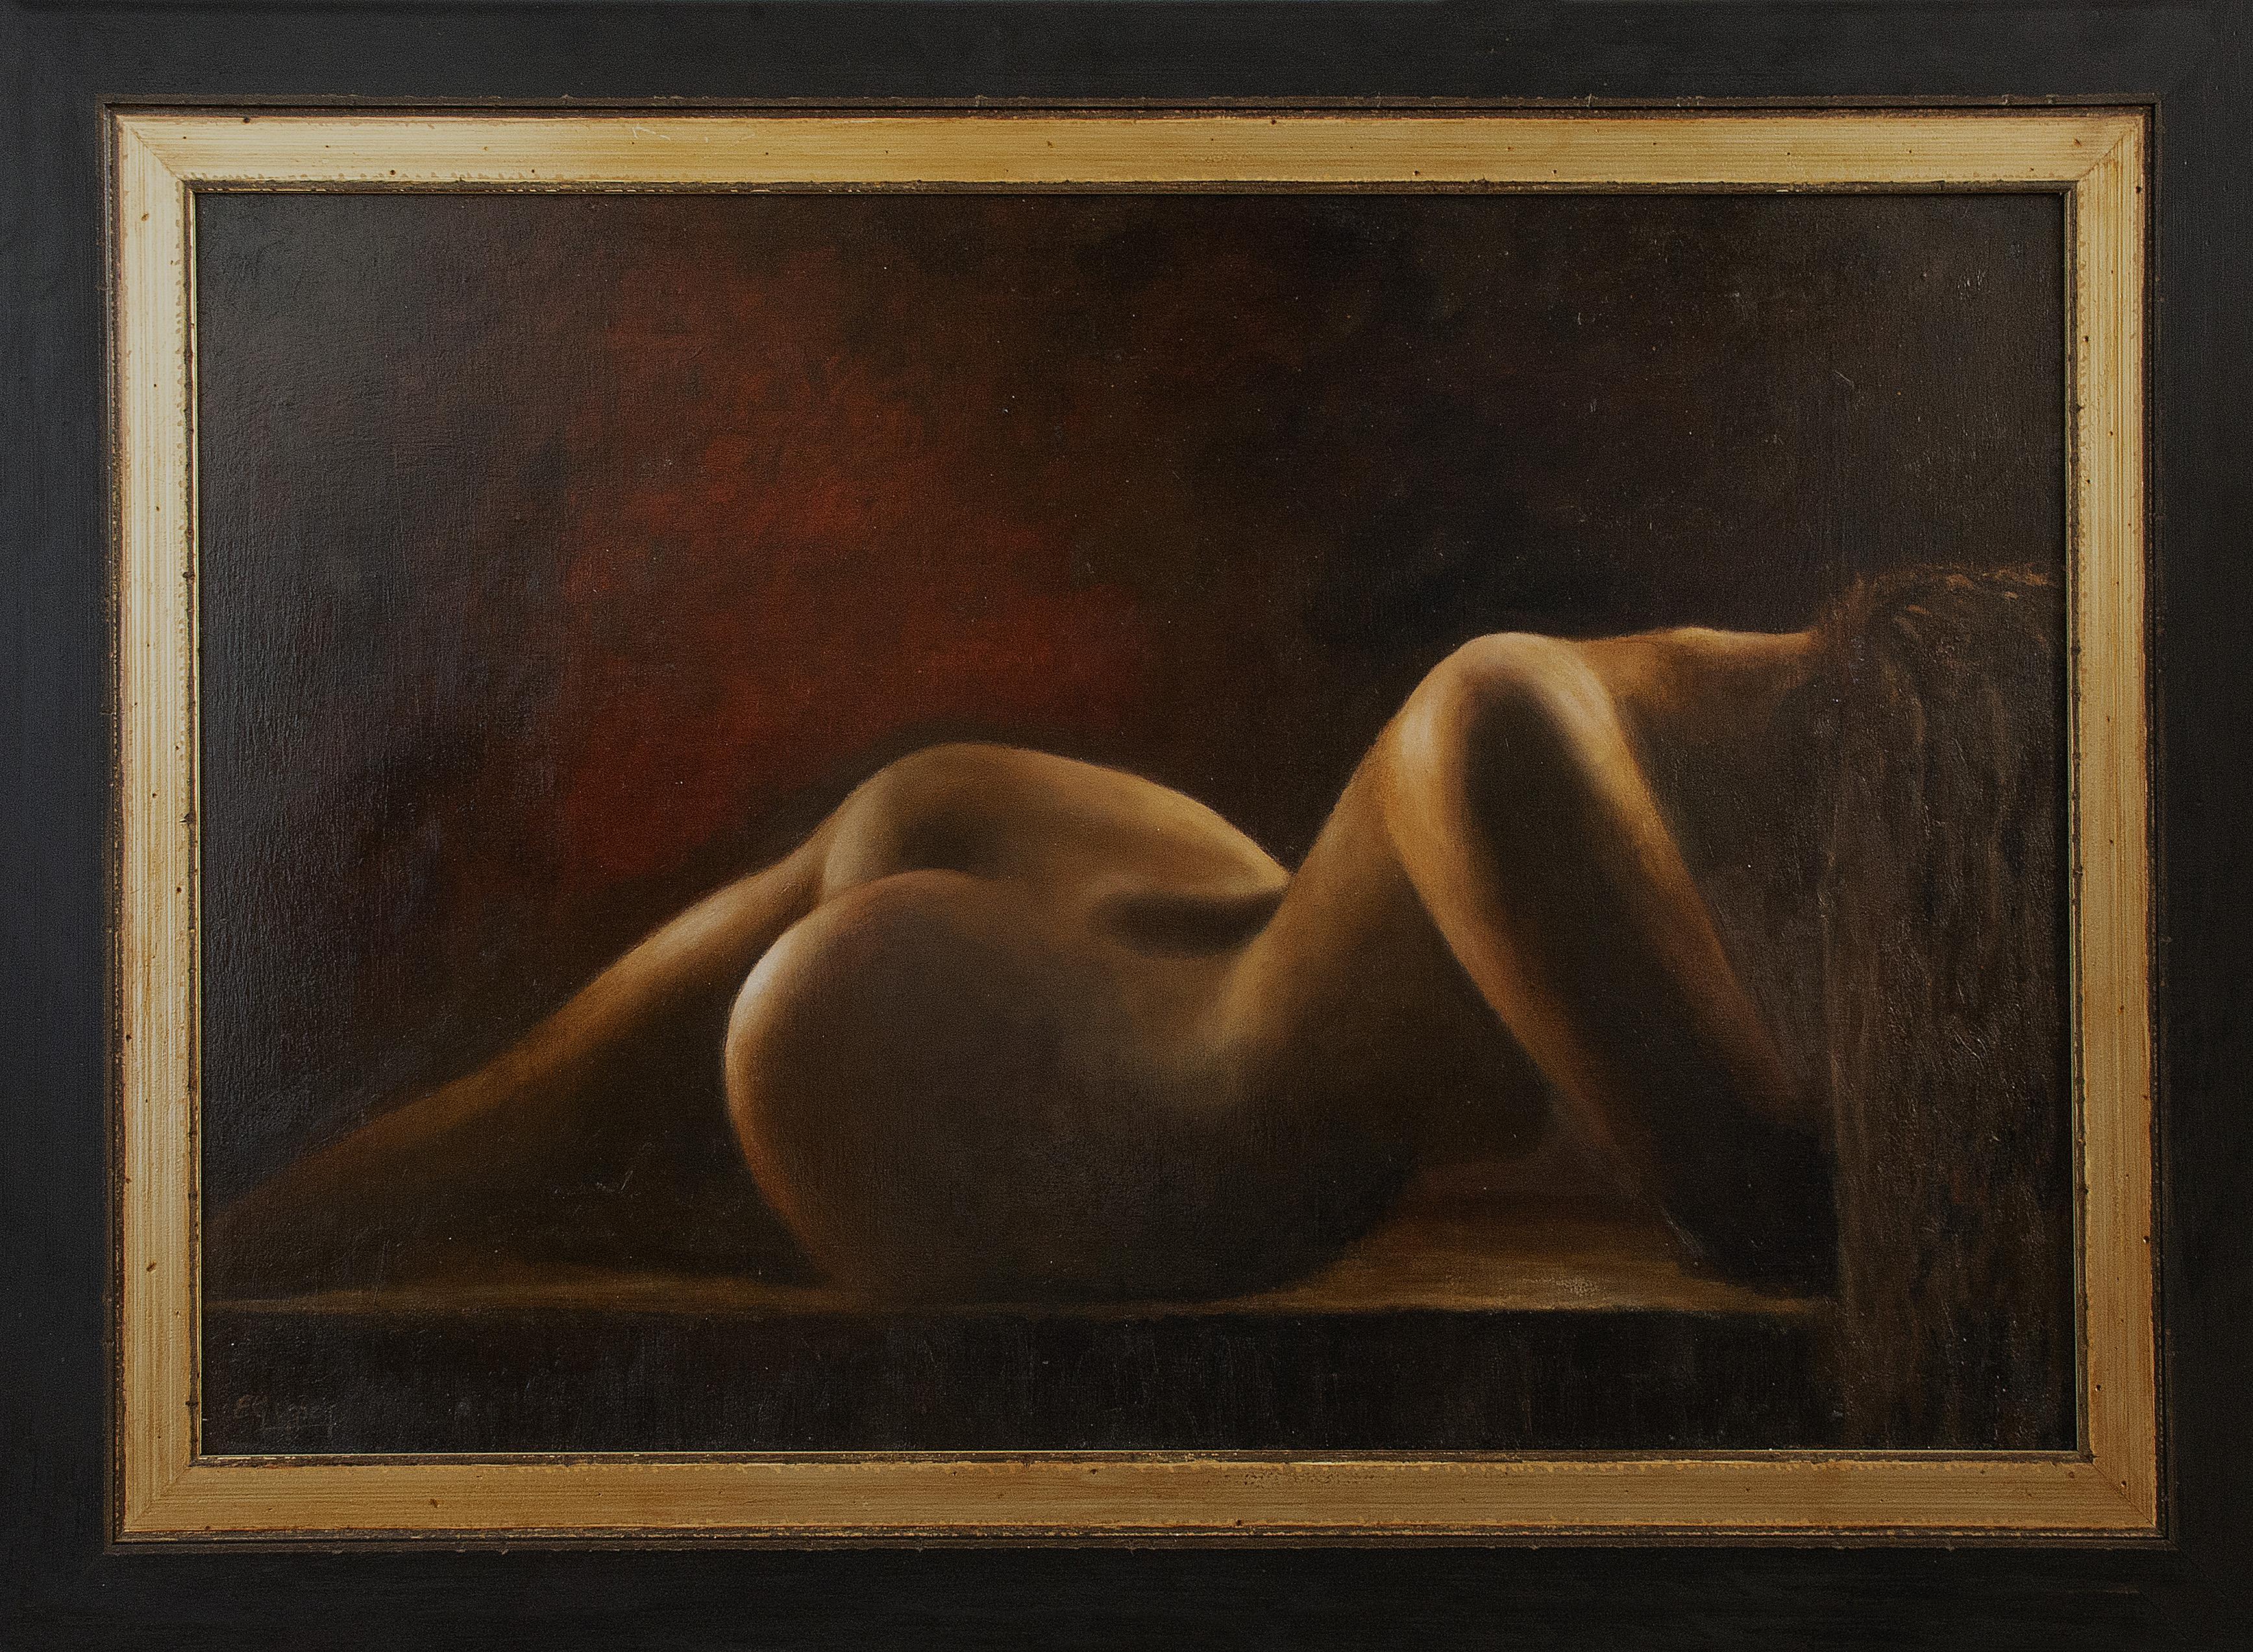 Vanitas artwork by Edwin IJpeij - art listed for sale on Artplode